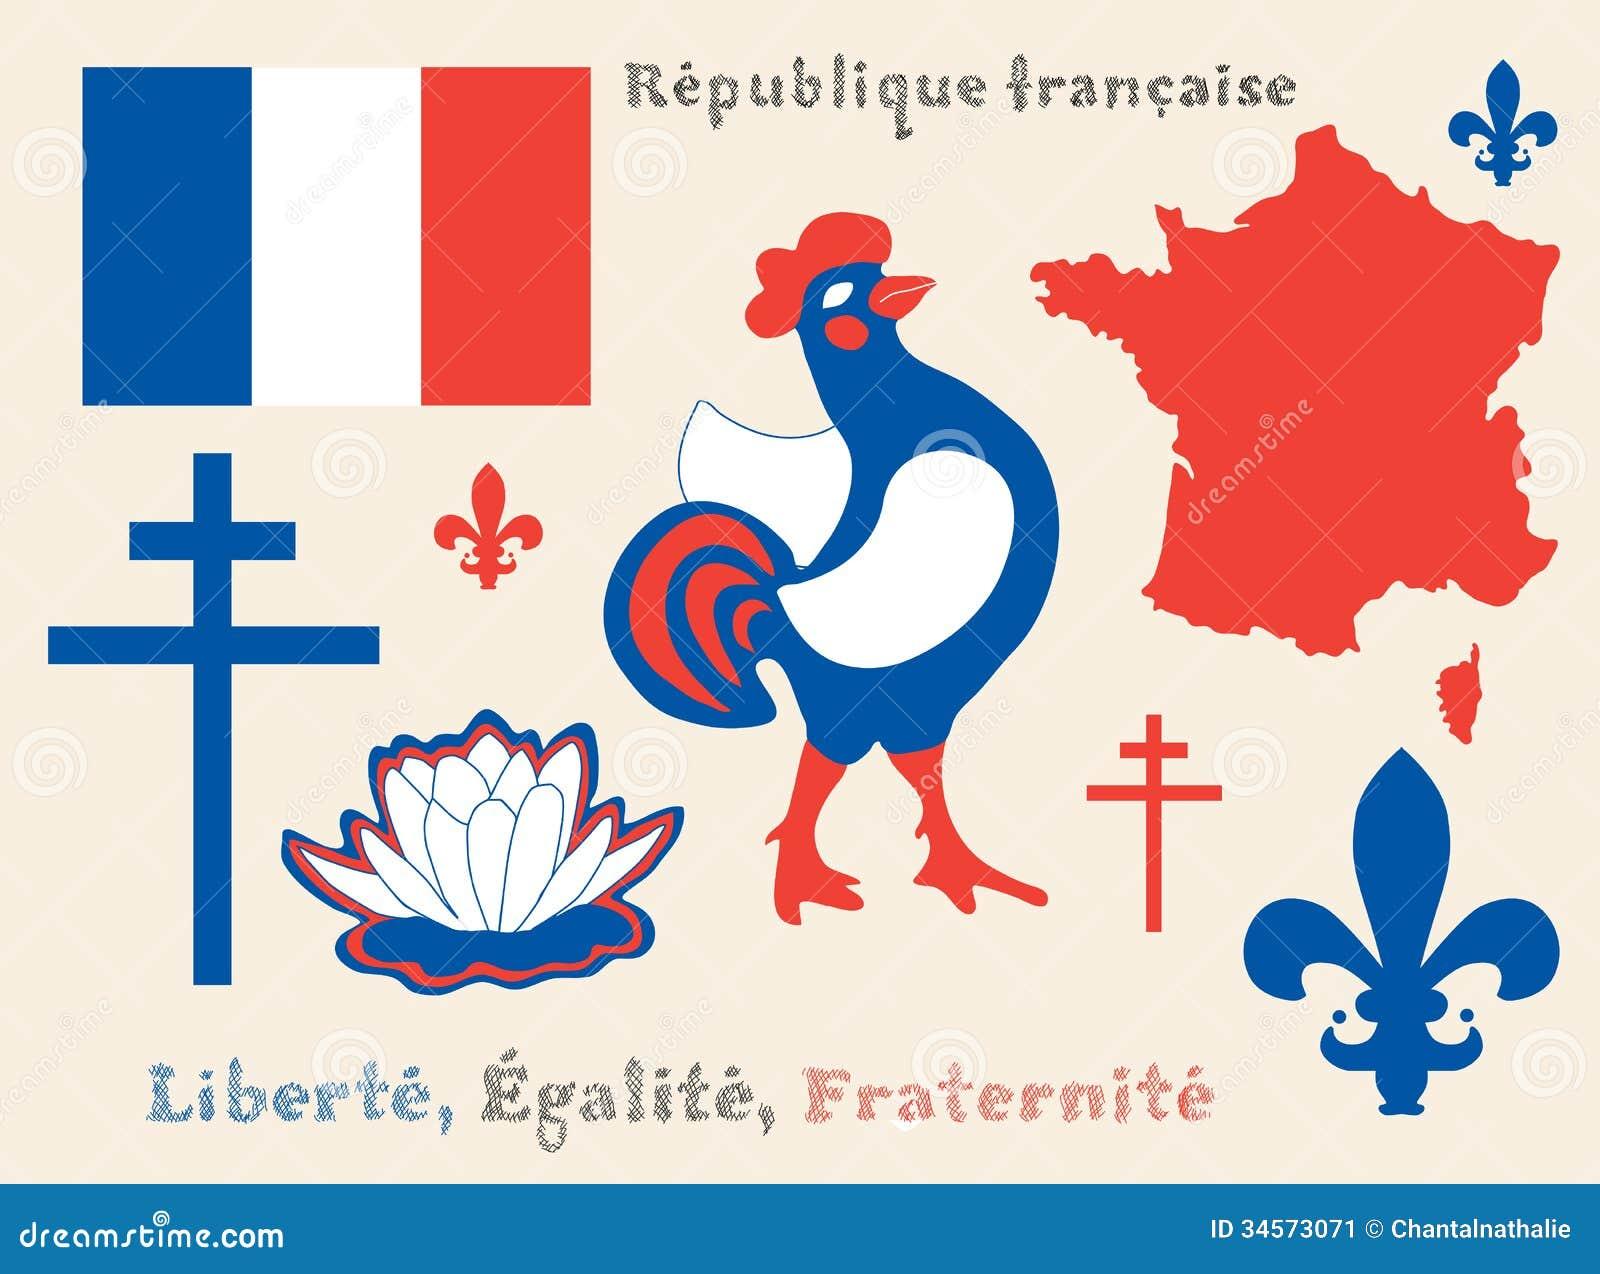 Set of principal symbols of French Republic, flag, map and slogan.